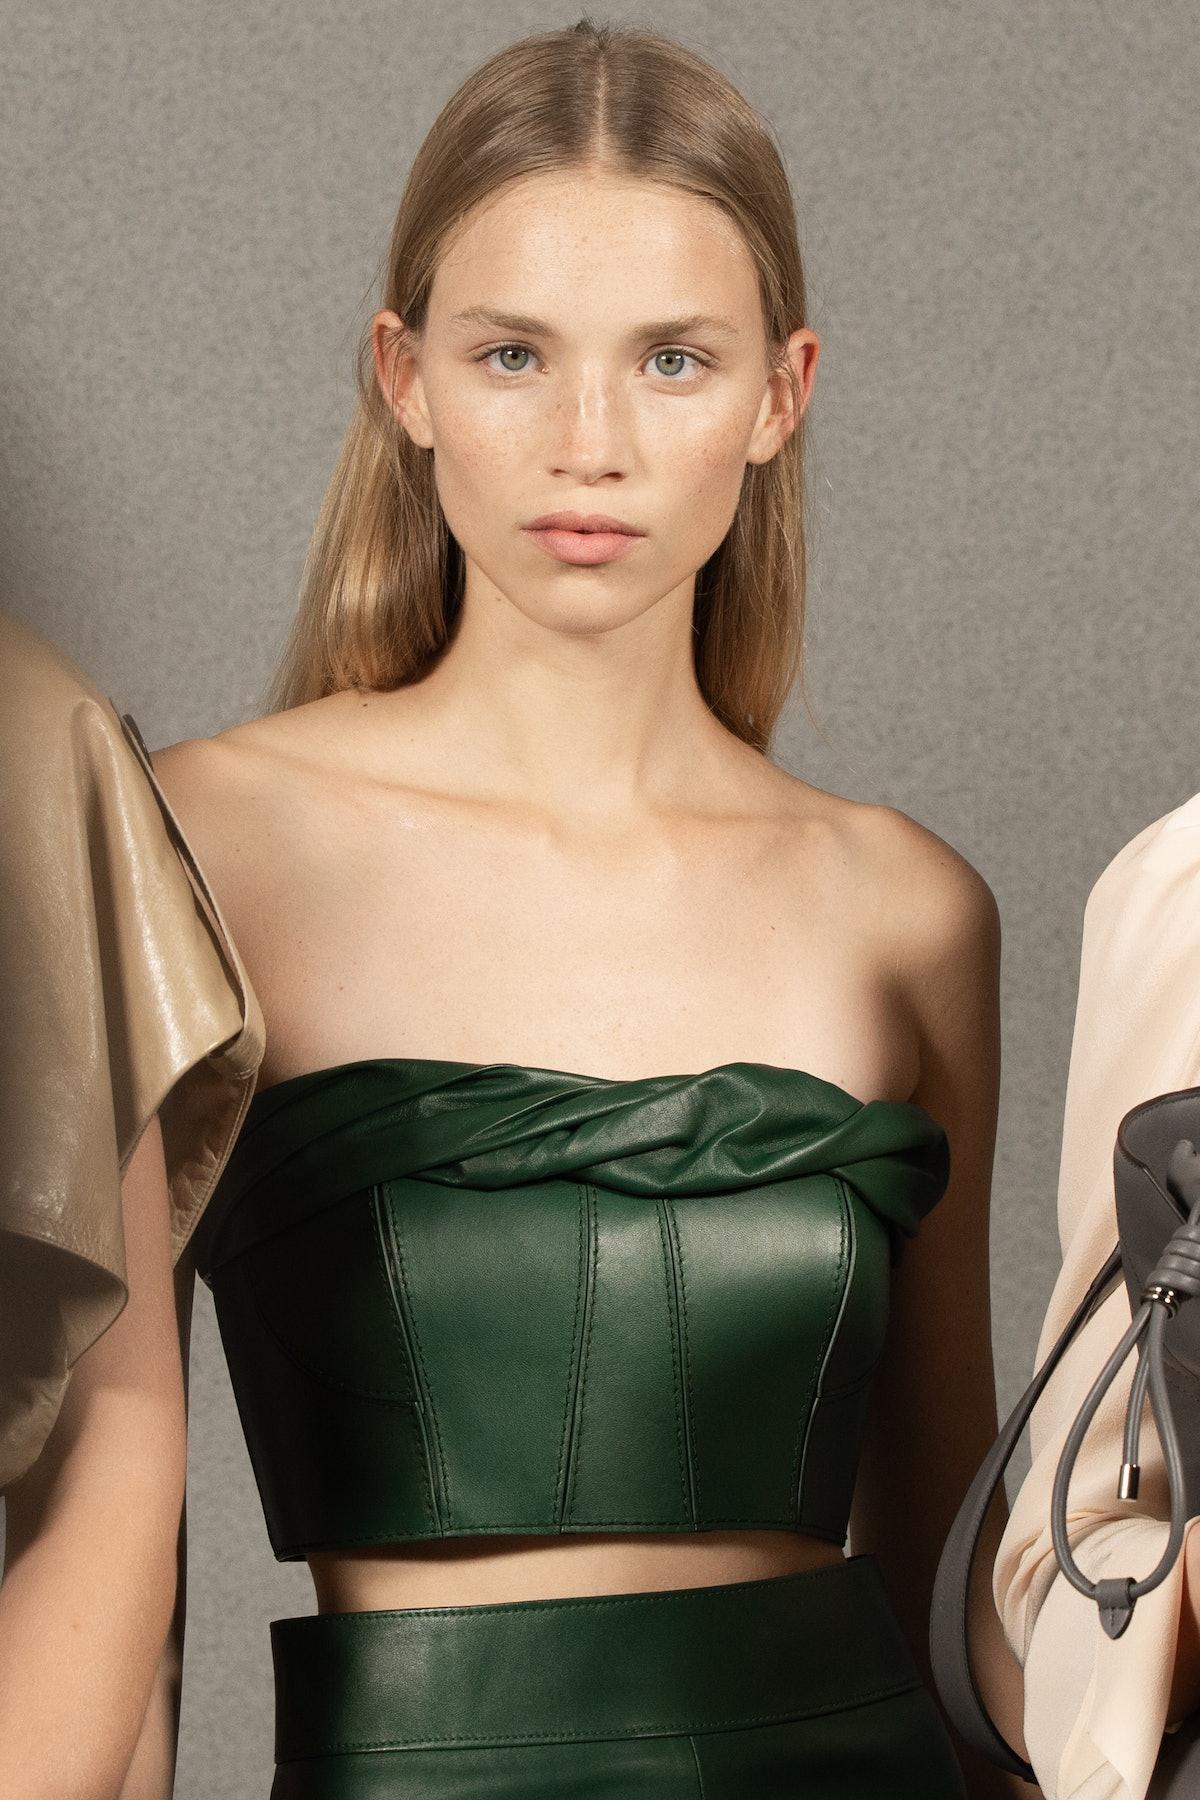 Serichai_Givenchy-092.jpg